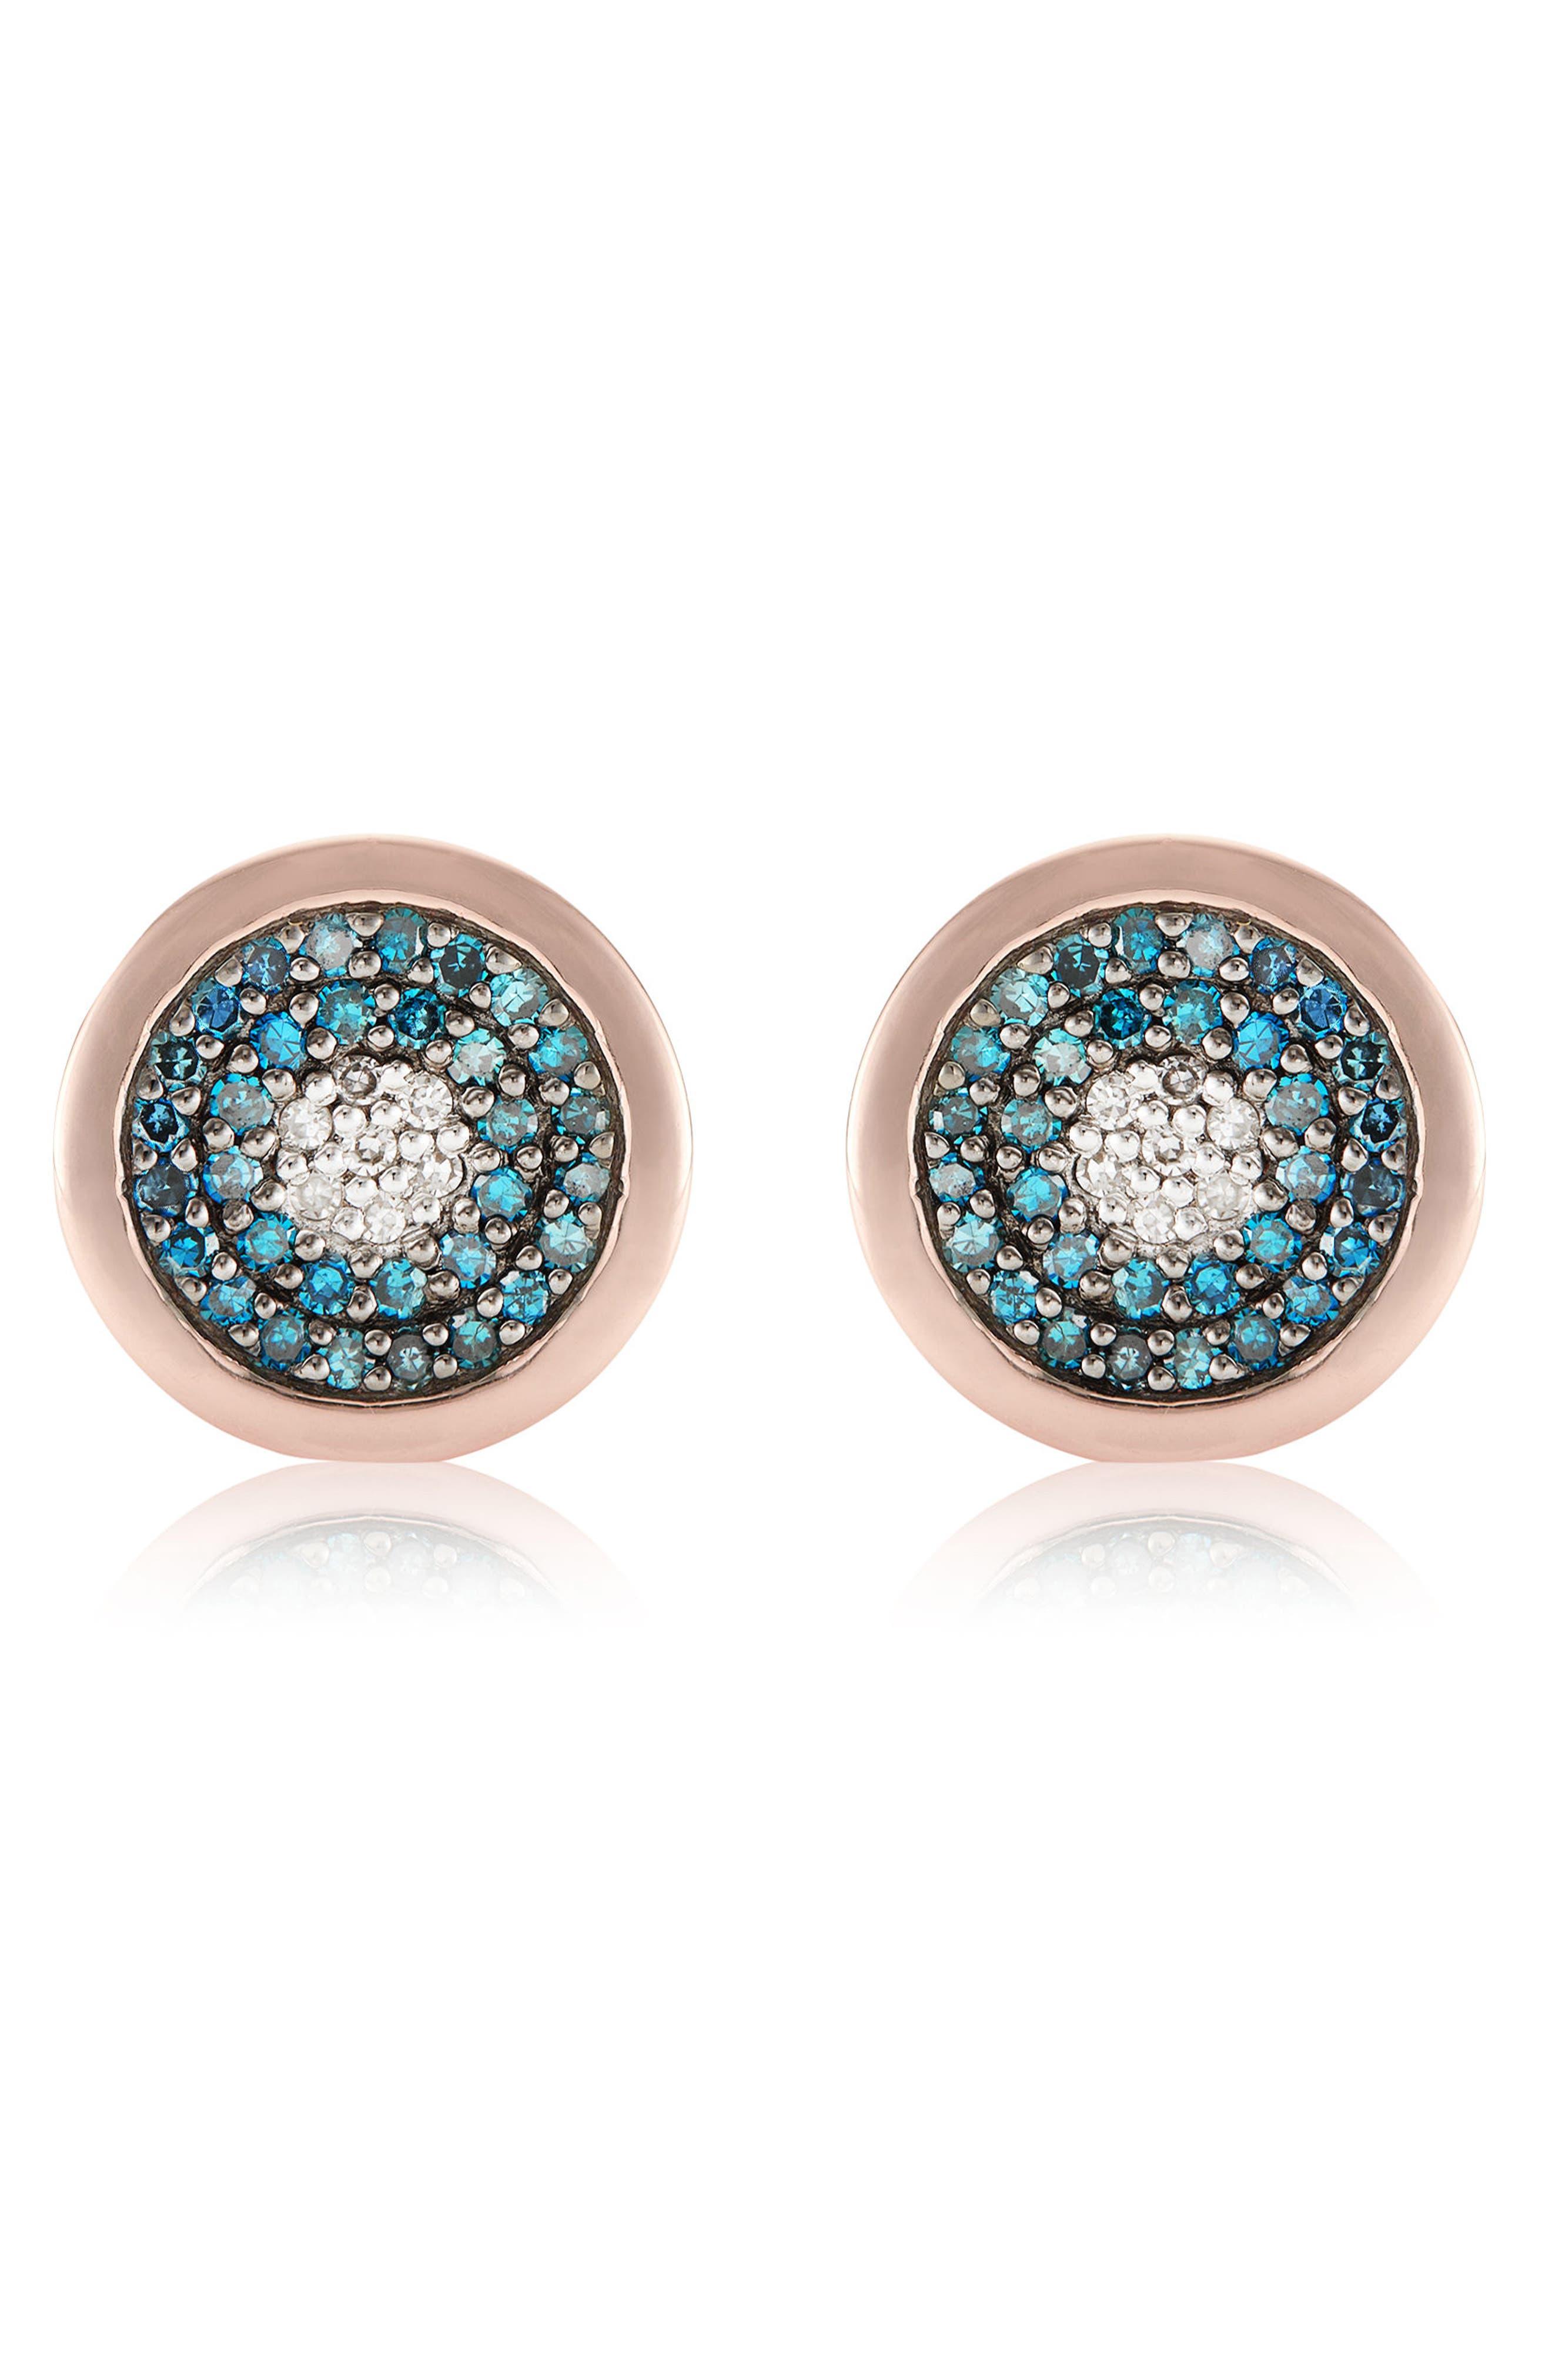 Evil Eye Stud Diamond Earrings,                         Main,                         color, Rose Gold/ Blue Diamond